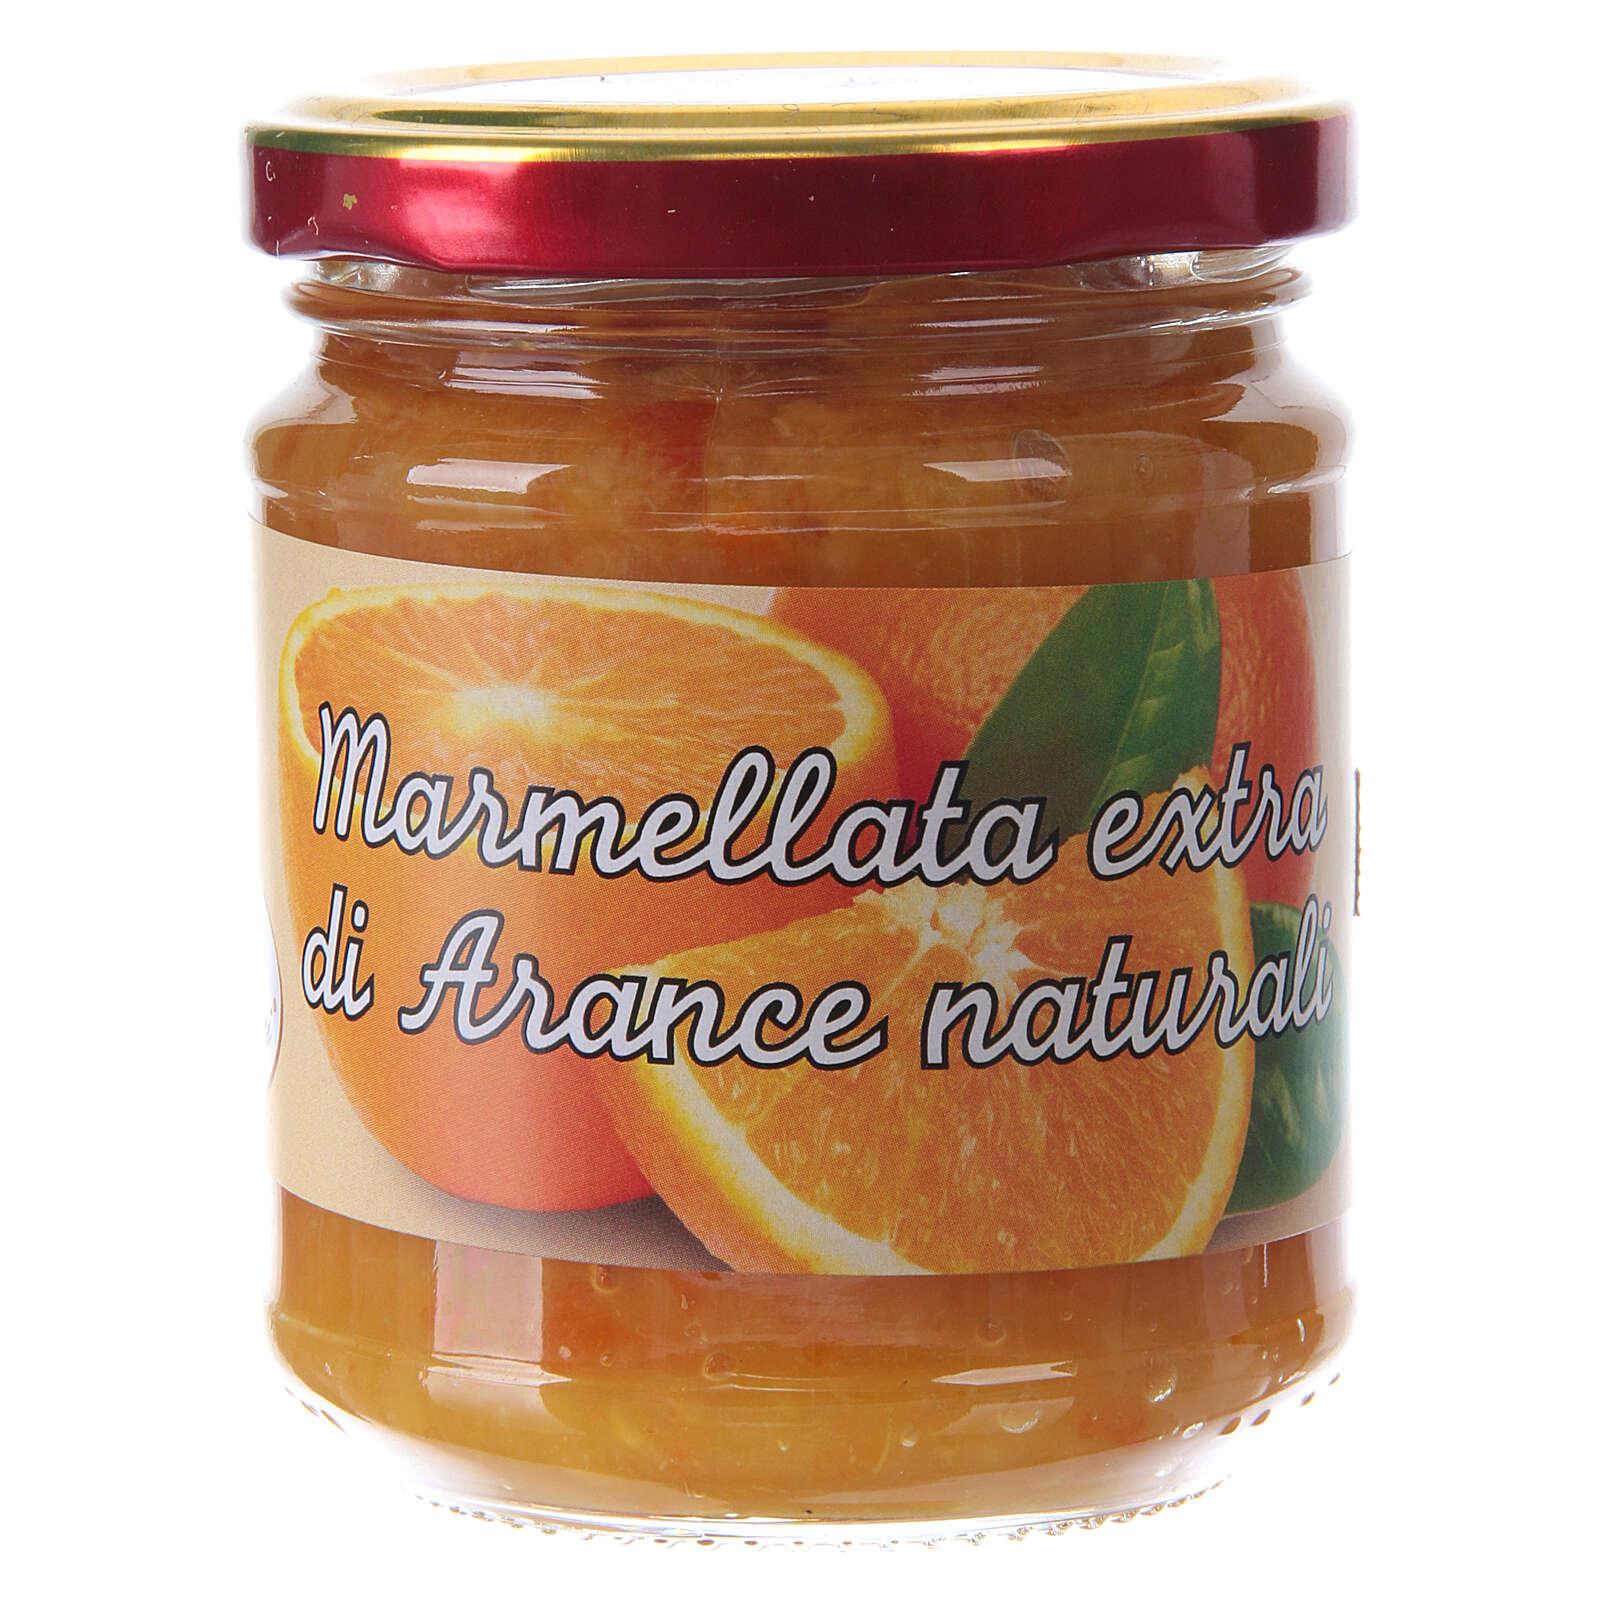 Mermelada extra de naranjas naturales 220 gr de San Antonio de Padua 3